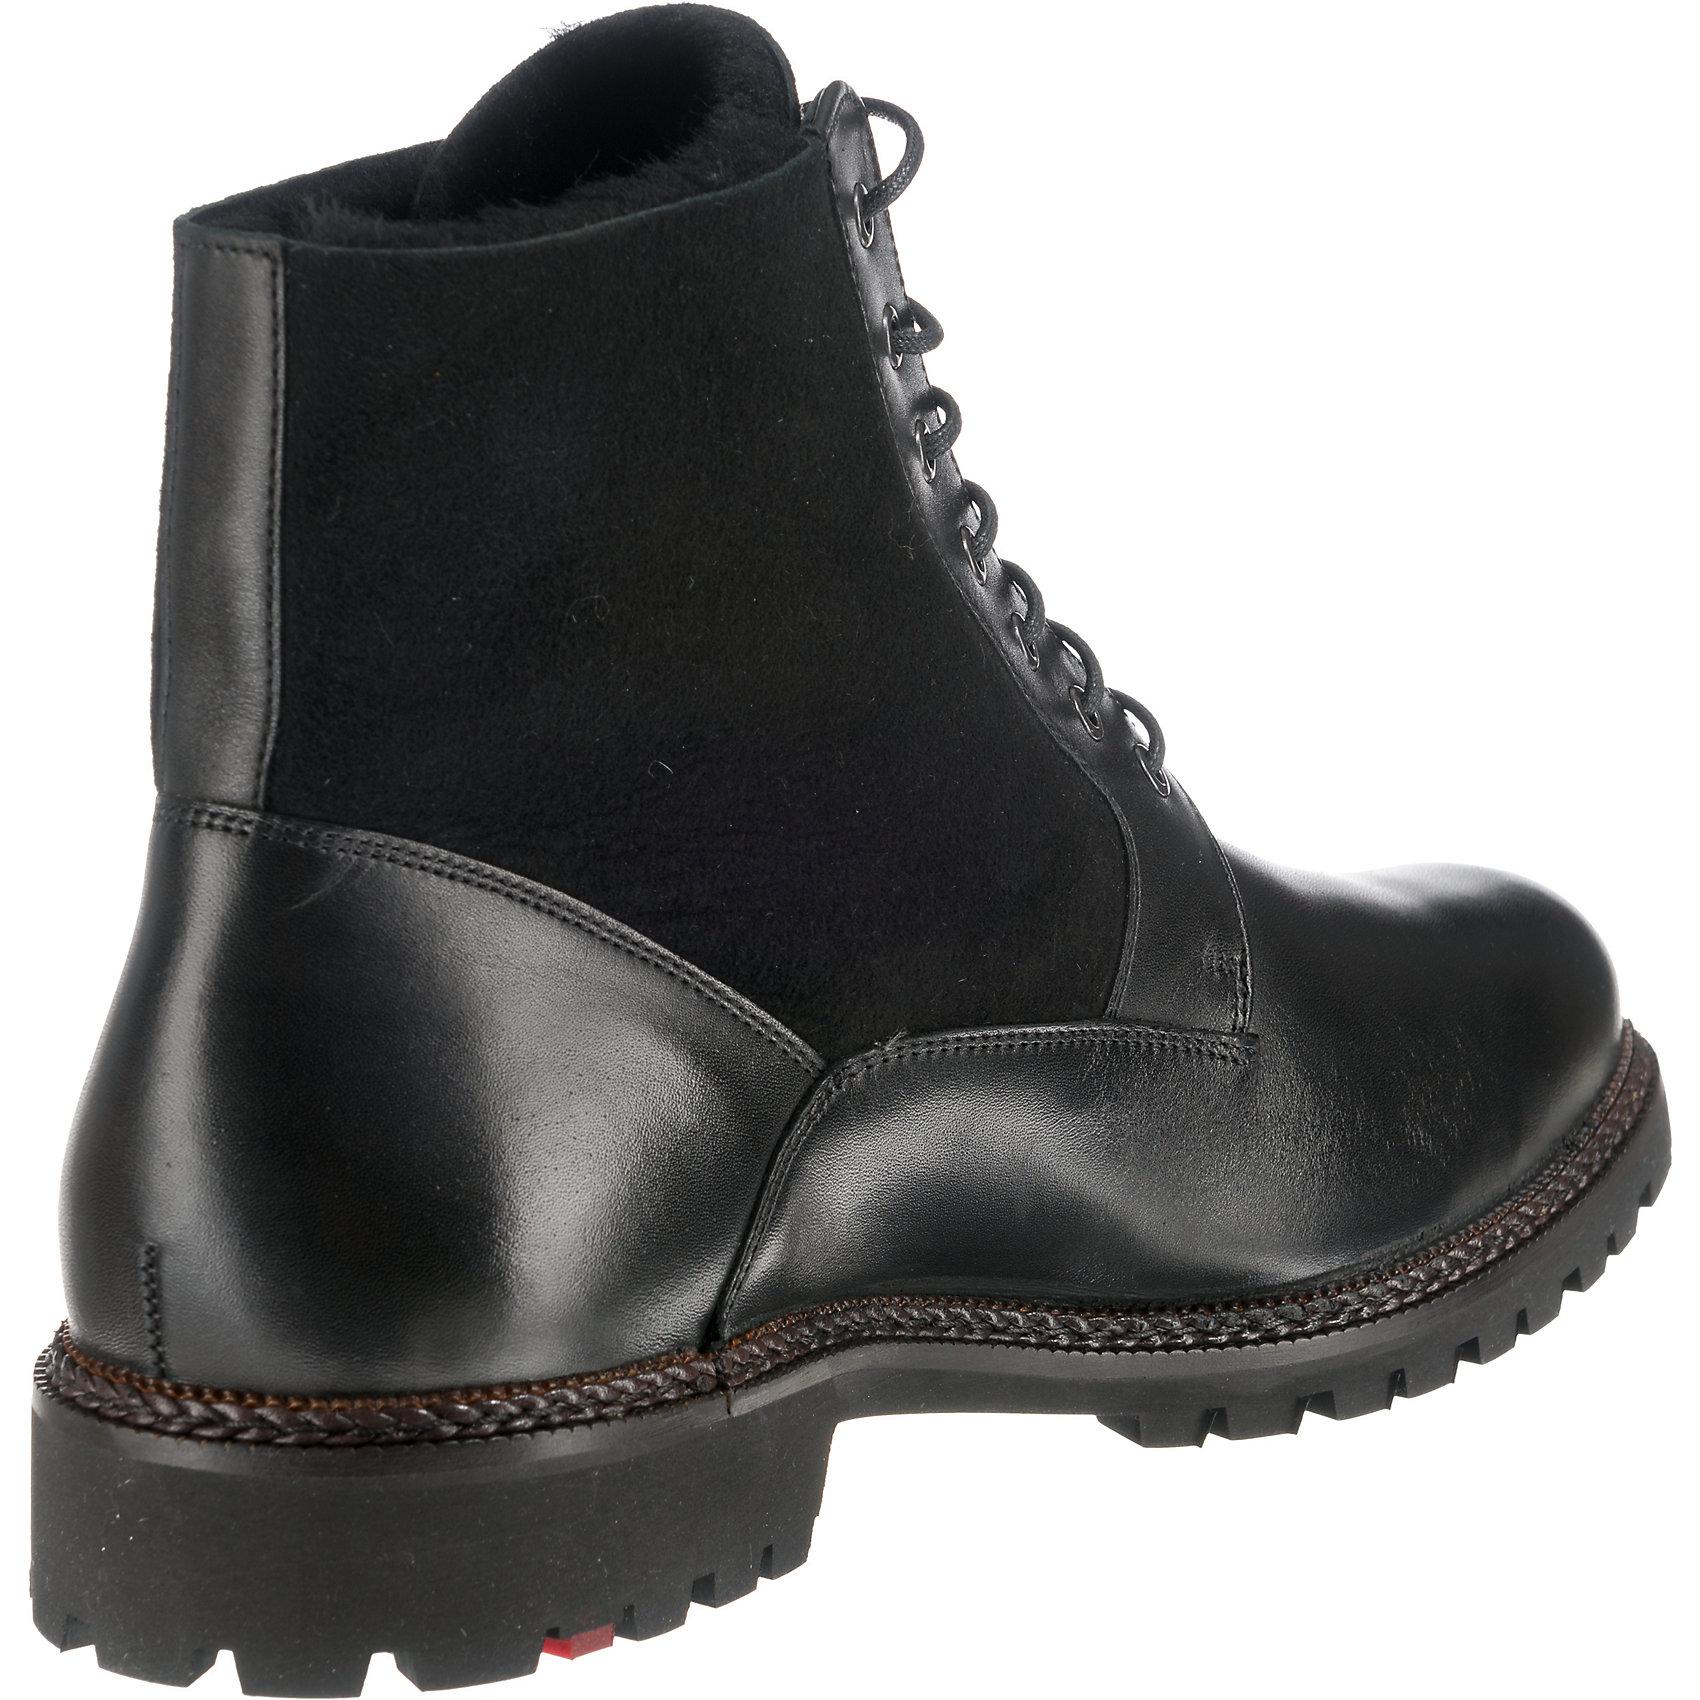 Neu LLOYD Gilford Winterstiefel 8396748 für Herren Herren Herren schwarz  4c821d